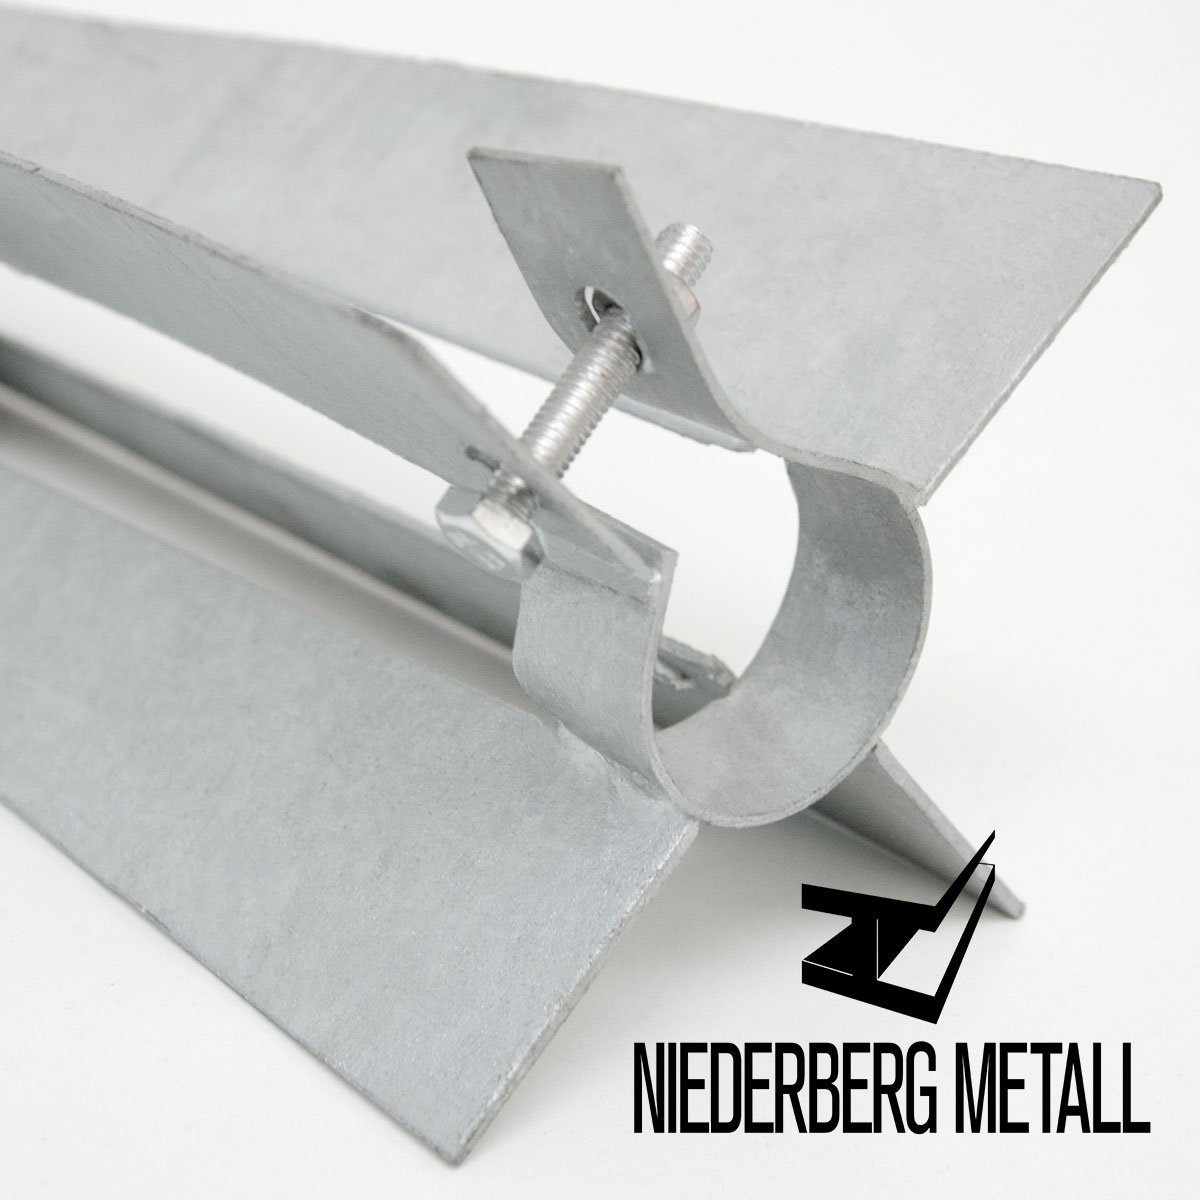 NIEDERBERG METALL Bodenhülse mit Klemmschelle 50cm Einschlaghülse